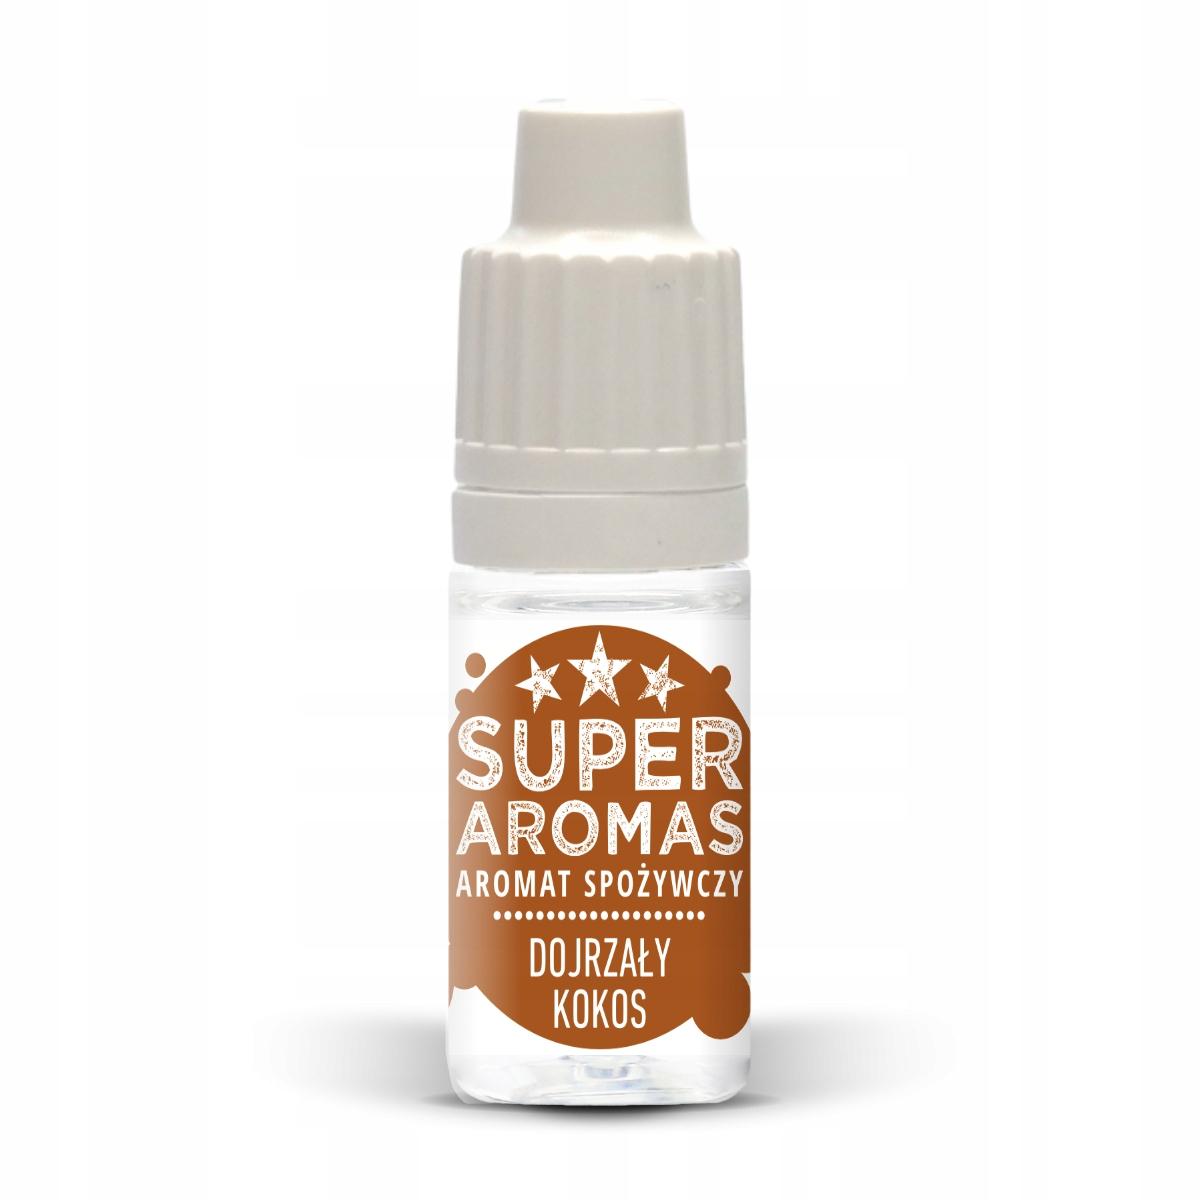 SUPER AROMAS Aromat spożywczy KOKOS 10 ml